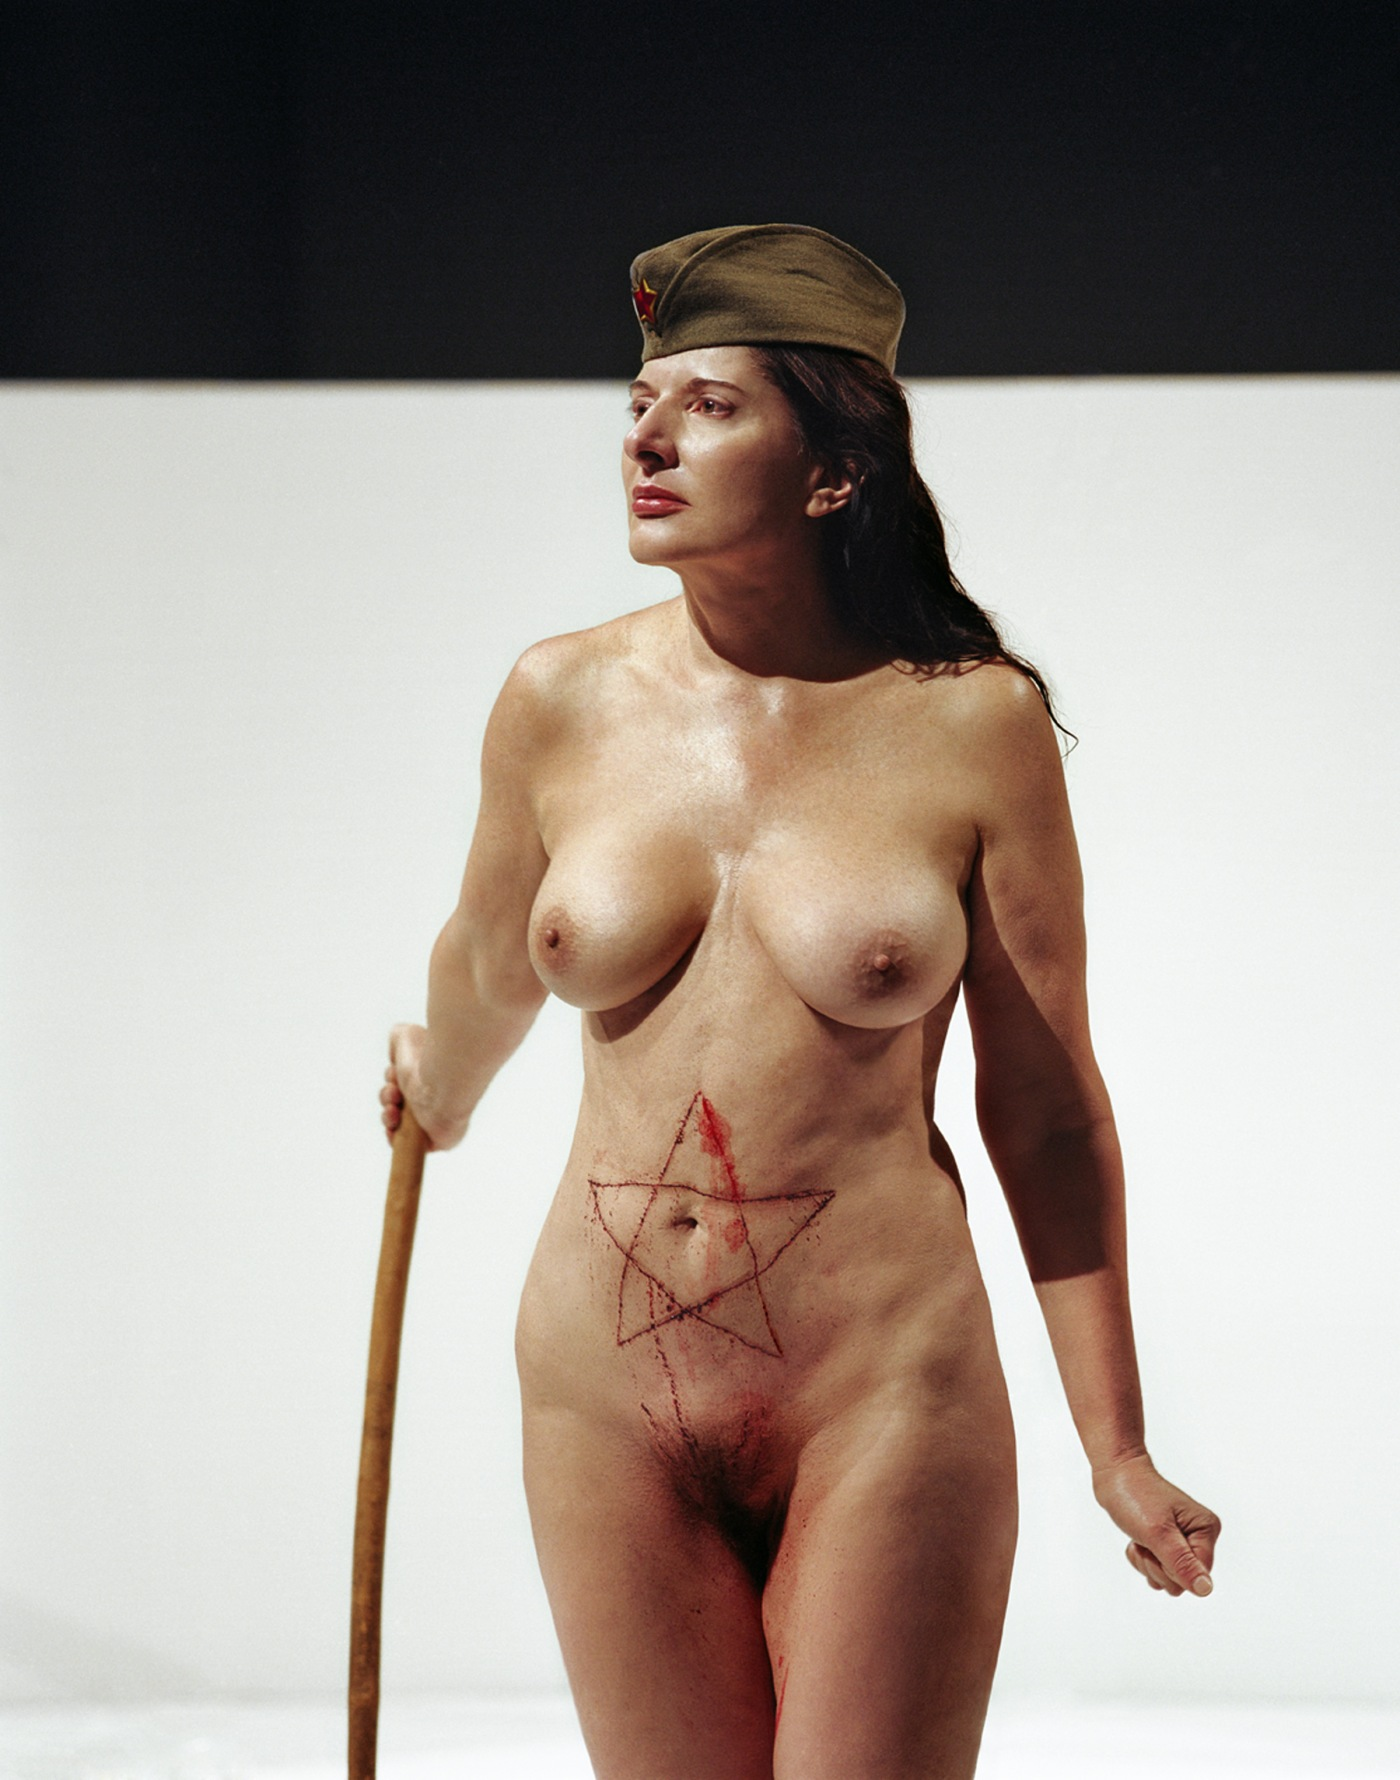 LIPSOFTHOMAS_Guggenheim2005